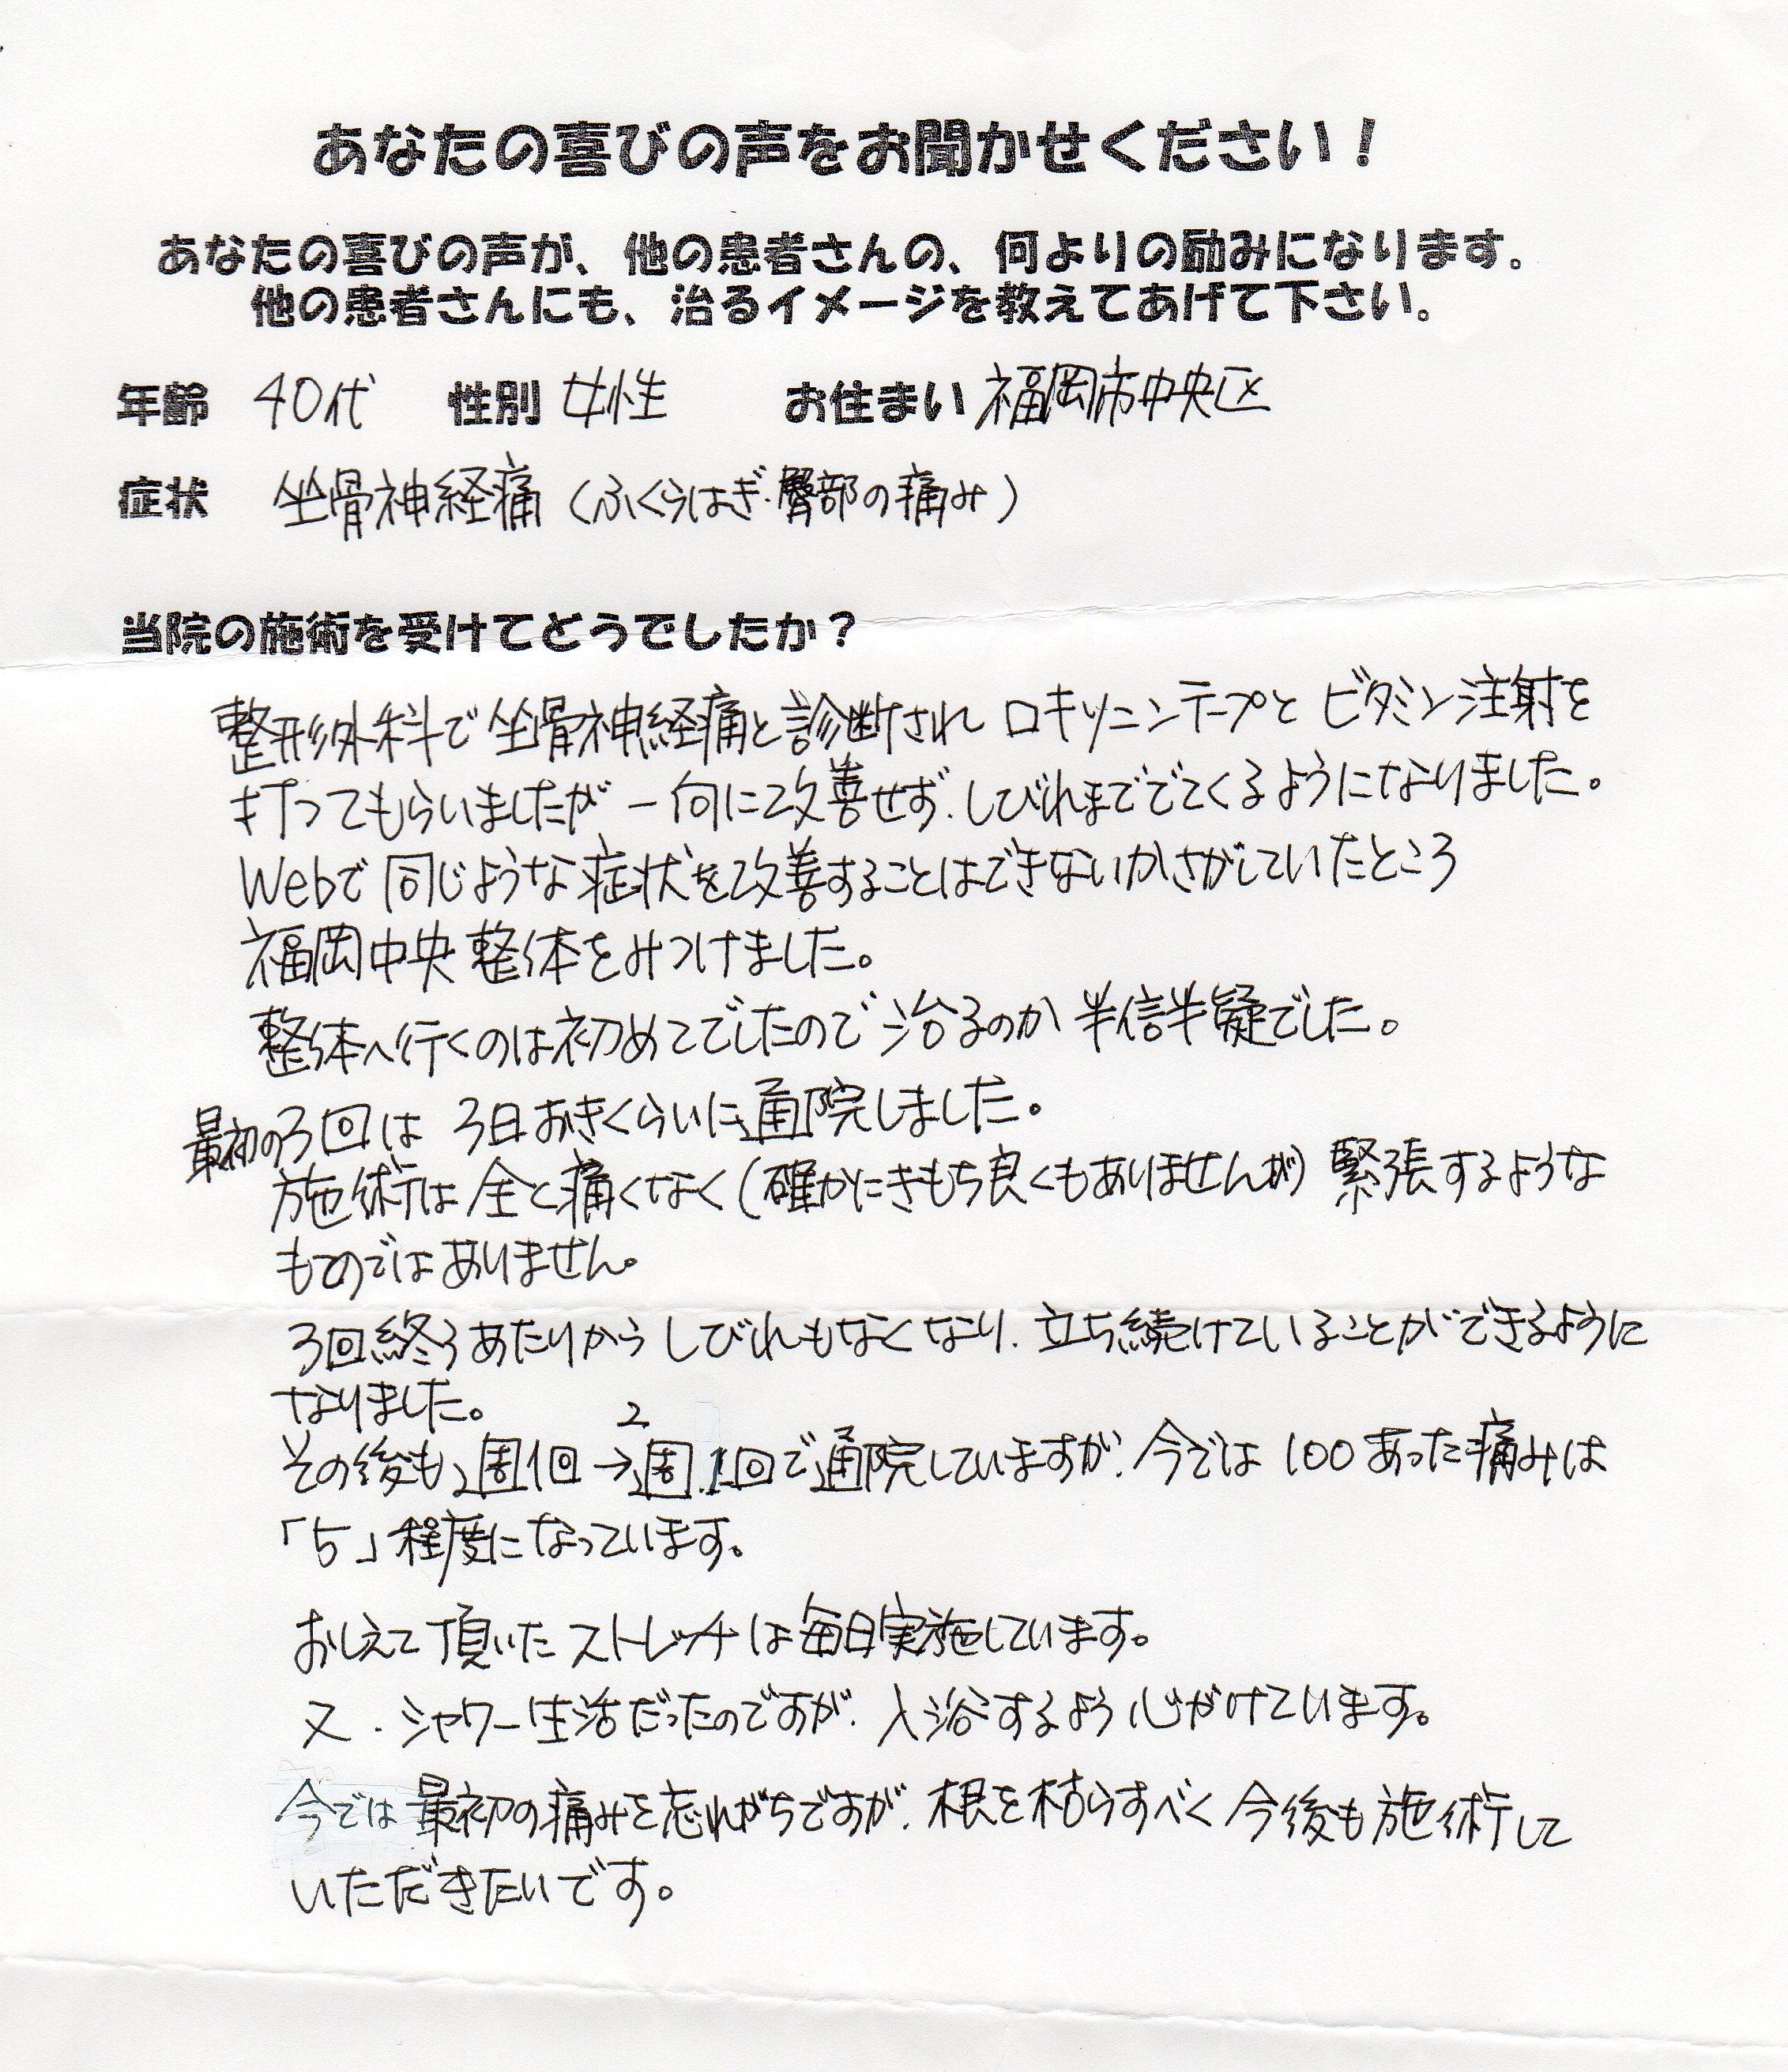 福岡整体・・・坐骨神経痛、腰痛、痺れで口コミ人気の整体院。